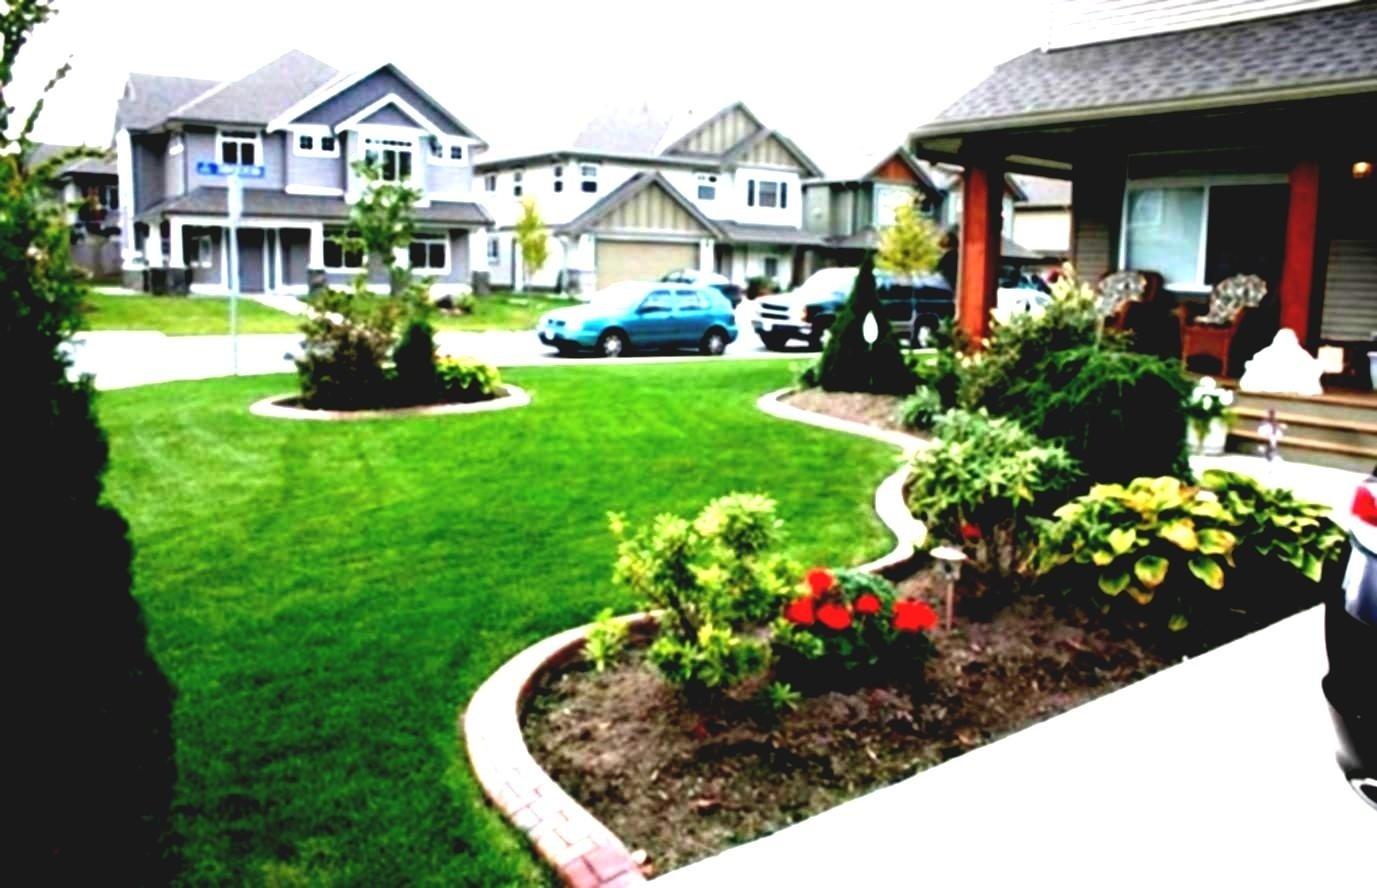 10 Attractive Low Maintenance Landscaping Ideas For Front Yard front yard low maintenance landscaping ideas amazing of garden 1 2021